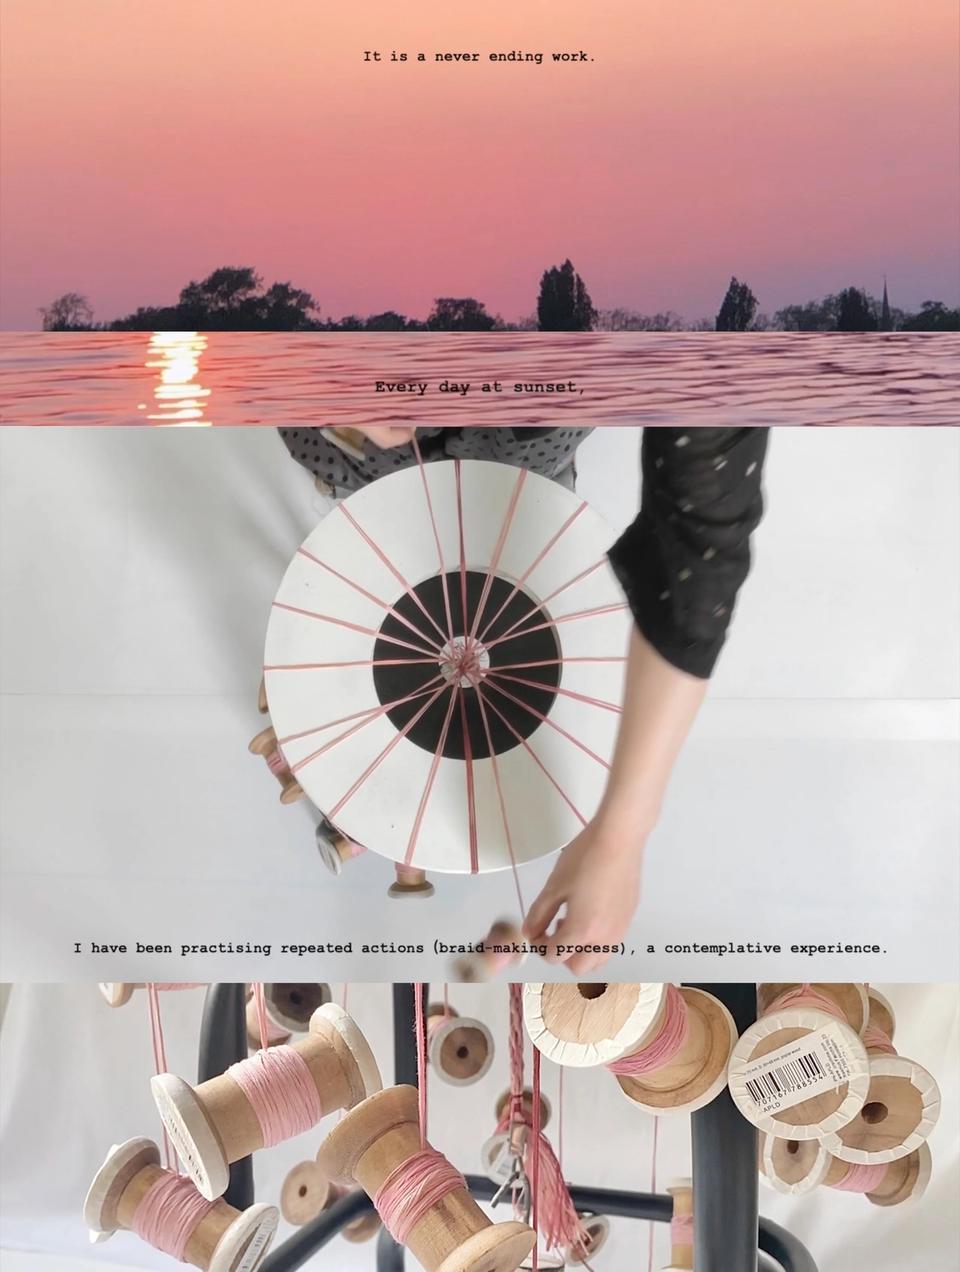 Mengqian Ge's 23 sunsets